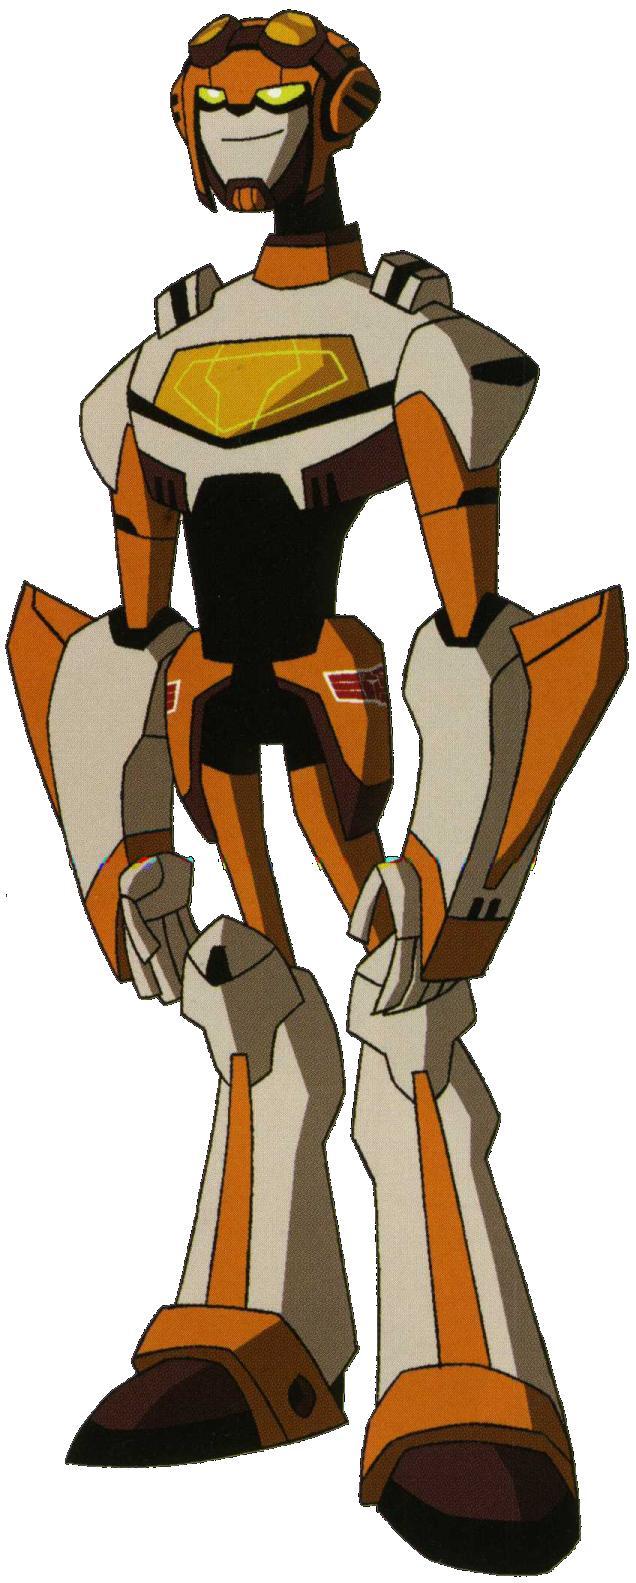 Jetfire (TFA) - Teletraan I: The Transformers Wiki - Age ...